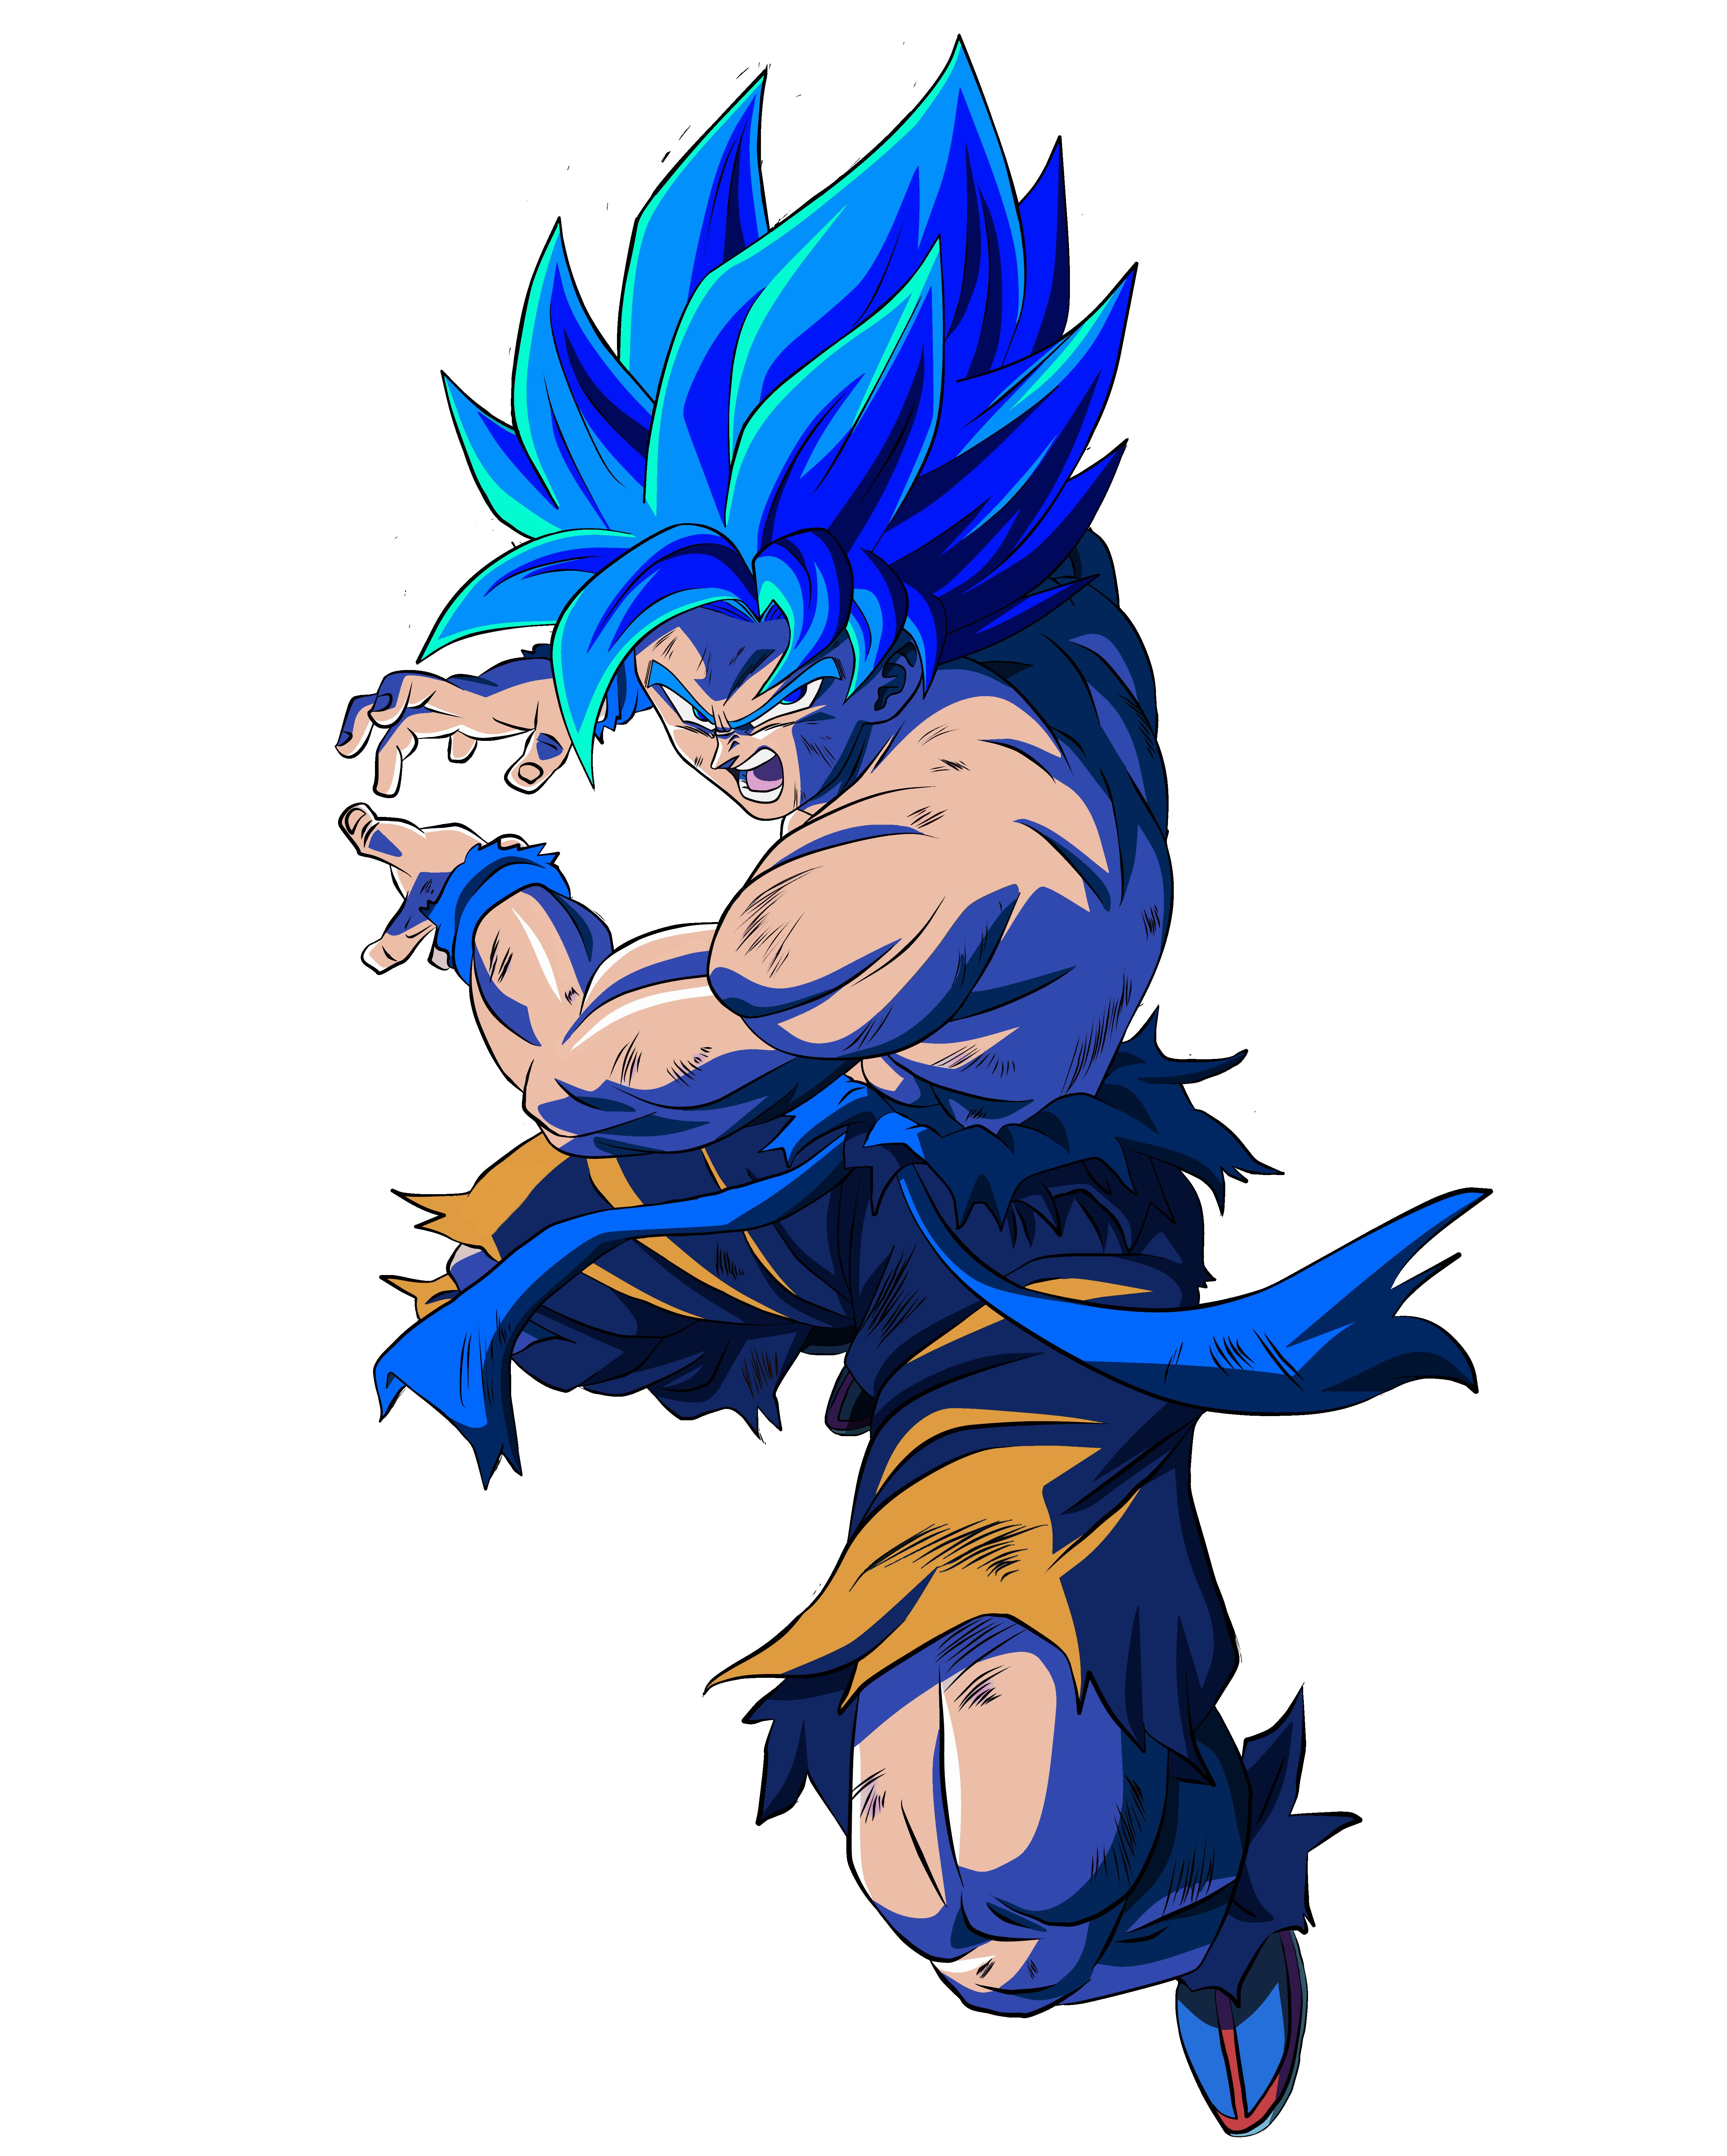 Dragon Ball Super By Dt501061 On Deviantart Anime Dragon Ball Super Anime Dragon Ball Dragon Ball Super